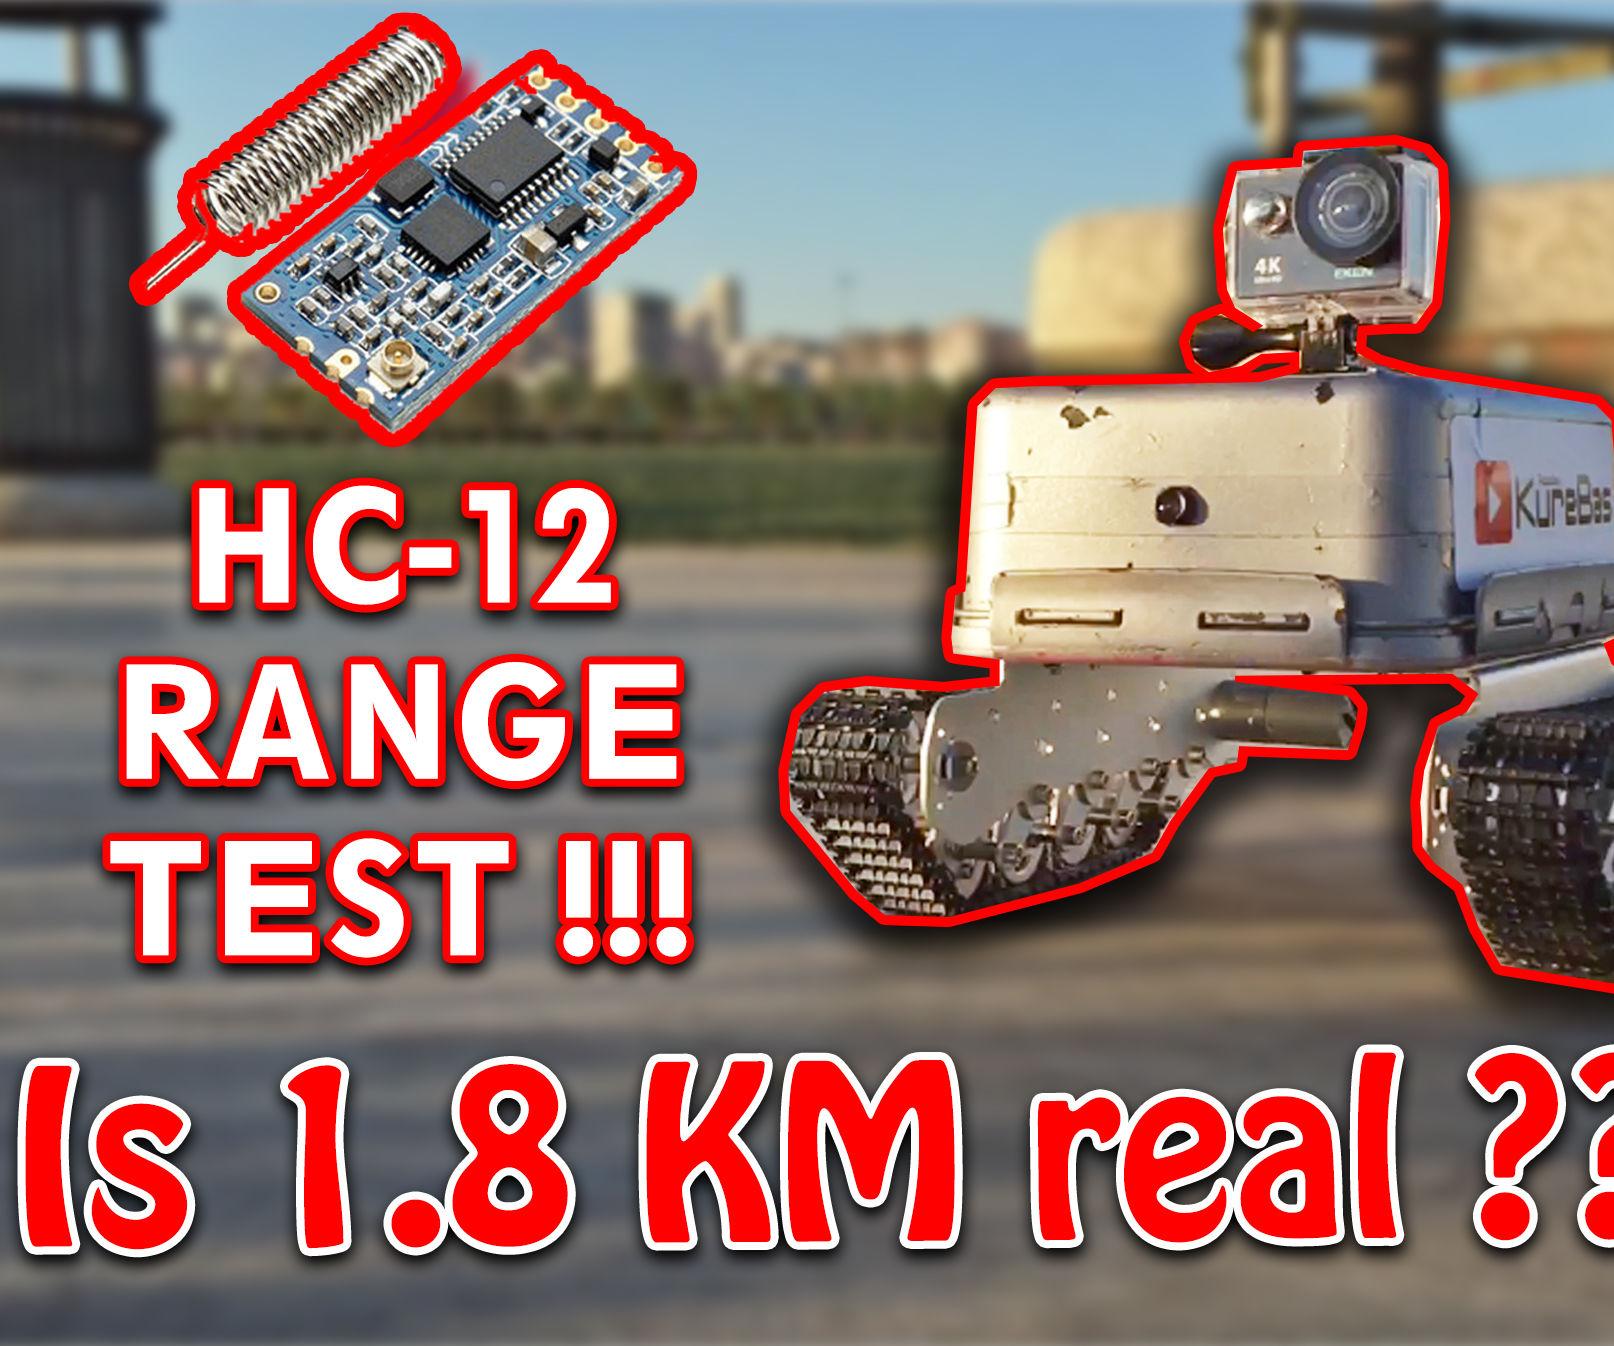 Long Range Explorer Arduino Tank - KureBas V3.0 (HC-12 1.8 KM)